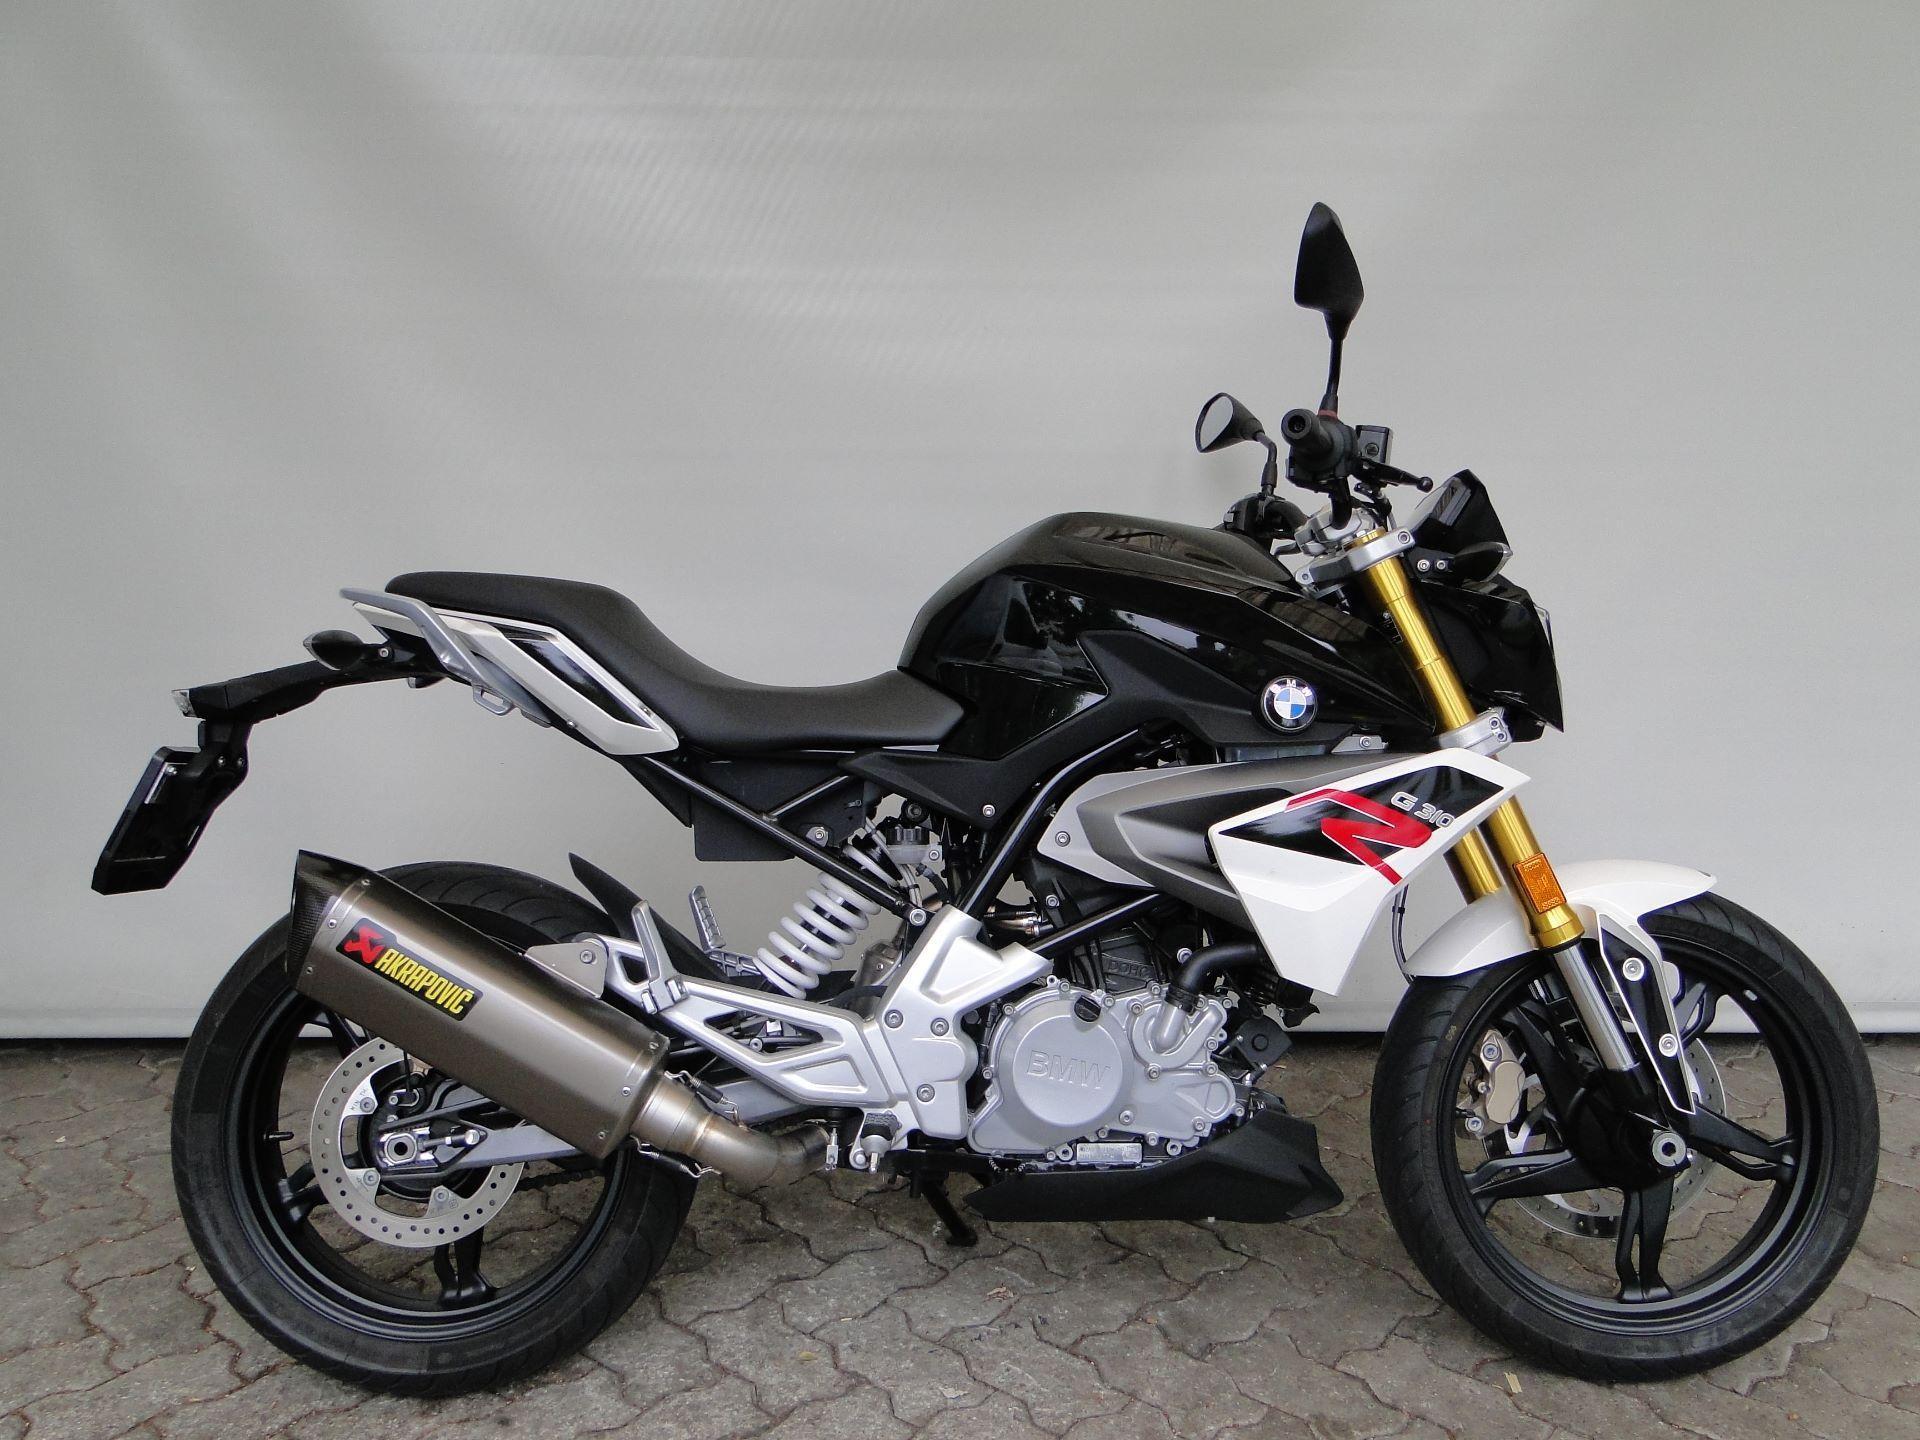 moto occasions acheter bmw g 310 r abs neu hobi moto ag winterthur. Black Bedroom Furniture Sets. Home Design Ideas